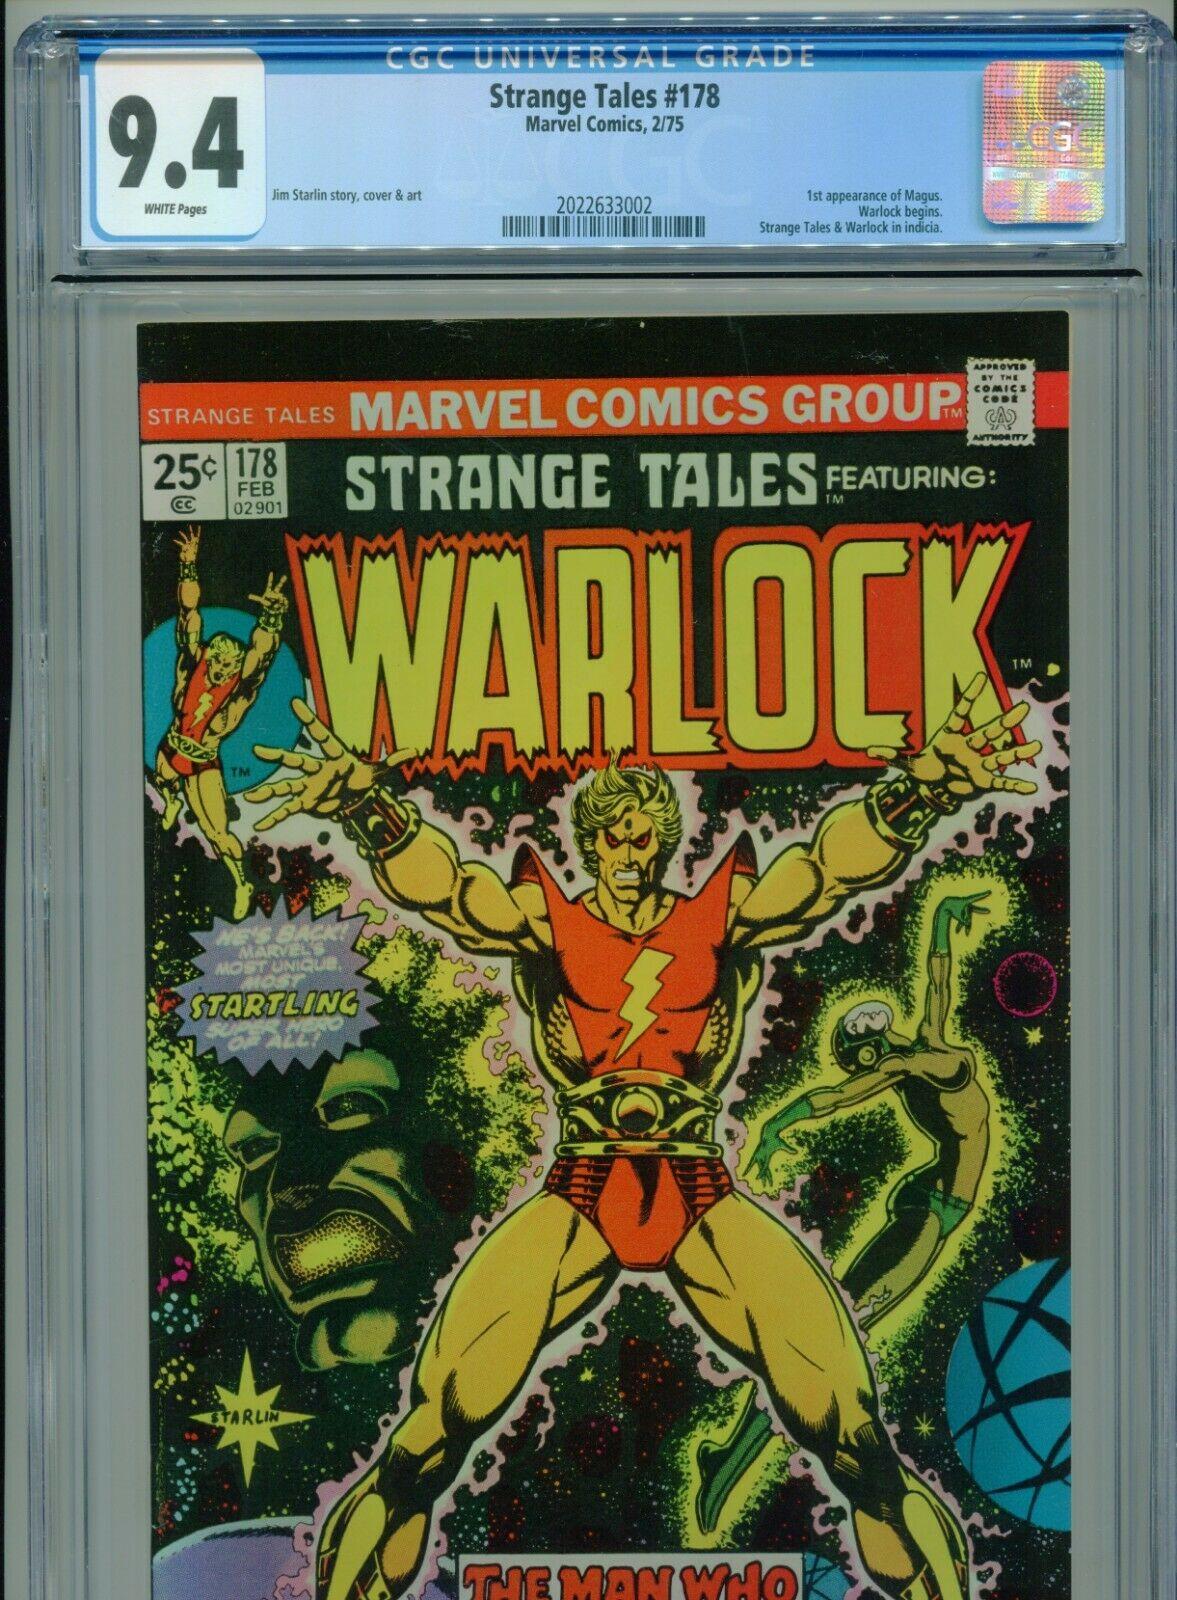 1978 MARVEL STRANGE TALES #178 WARLOCK 1ST APPEARANCE MAGUS CGC 9.4 WHITE BOX1